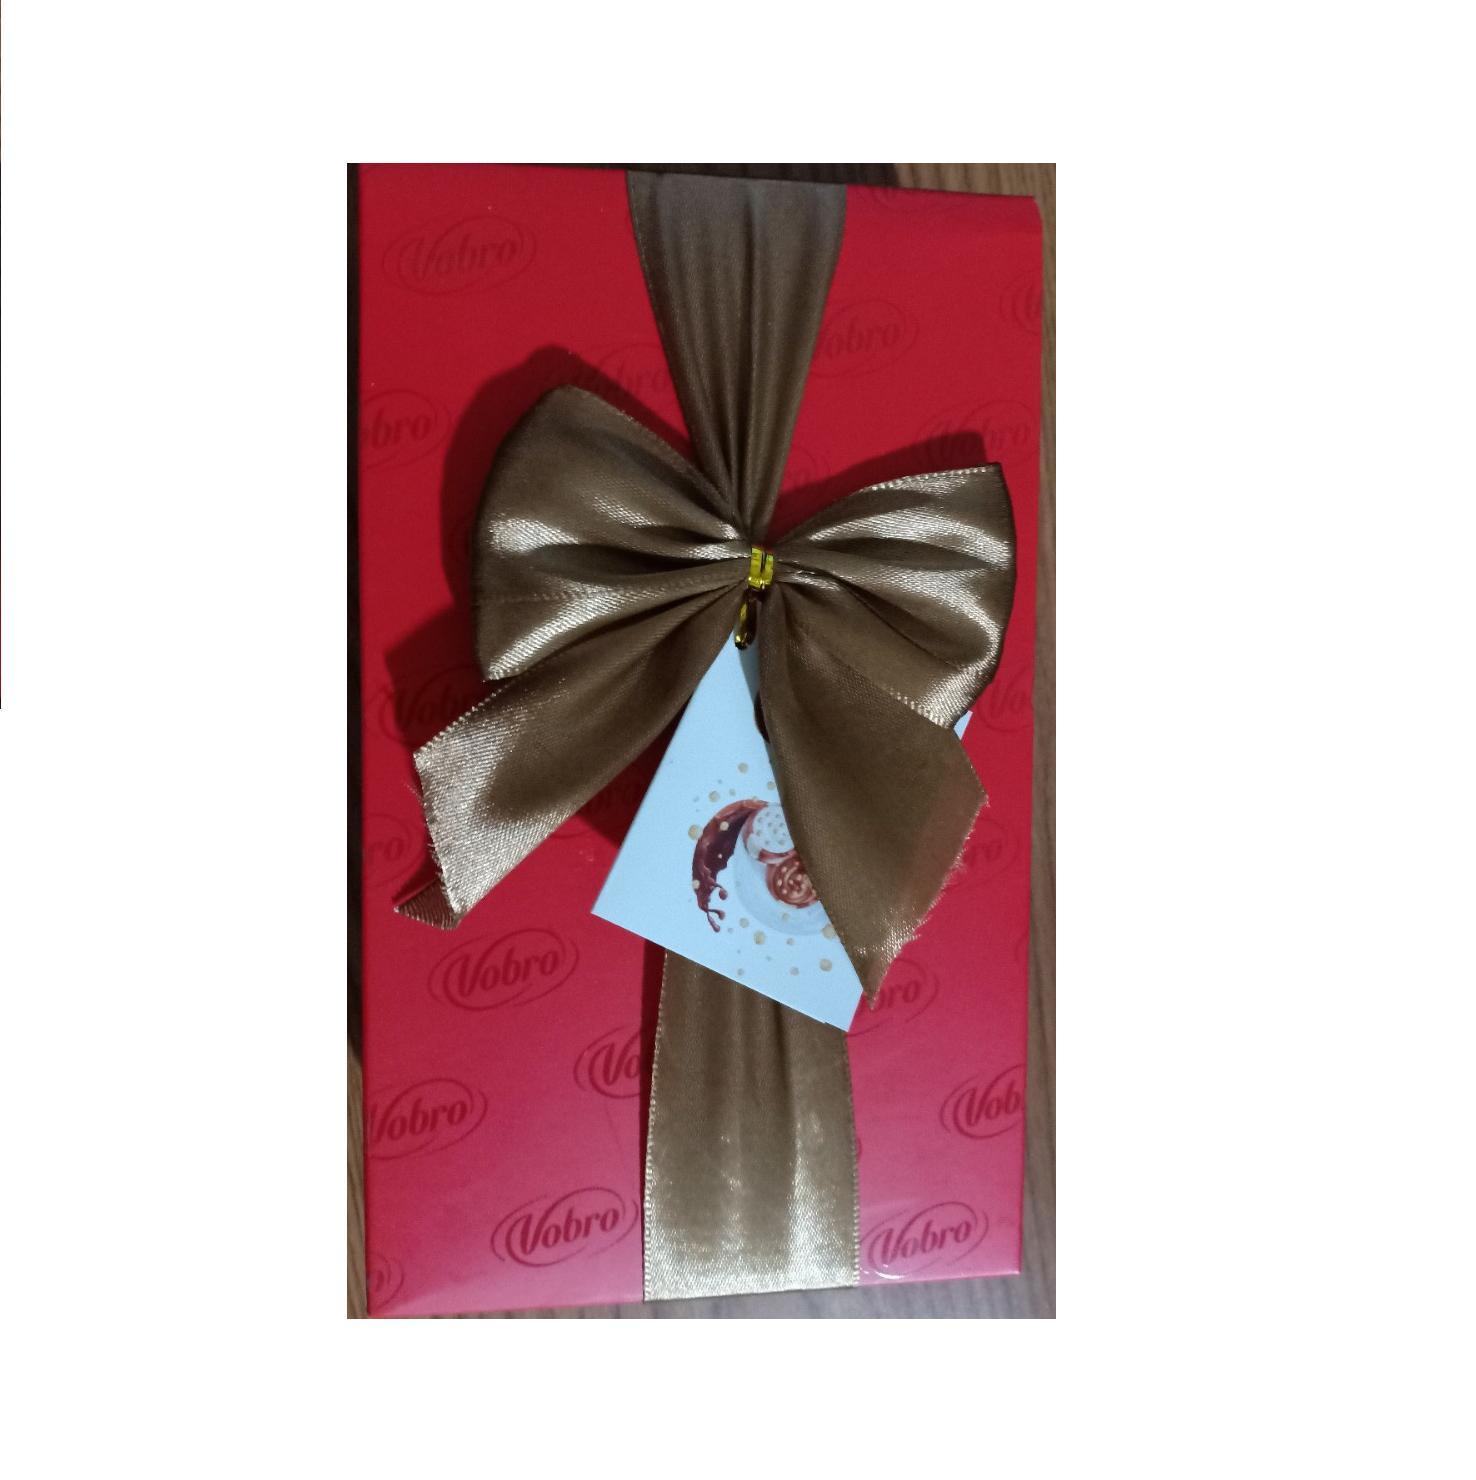 Kẹo socola choco crispo 185g có nơ